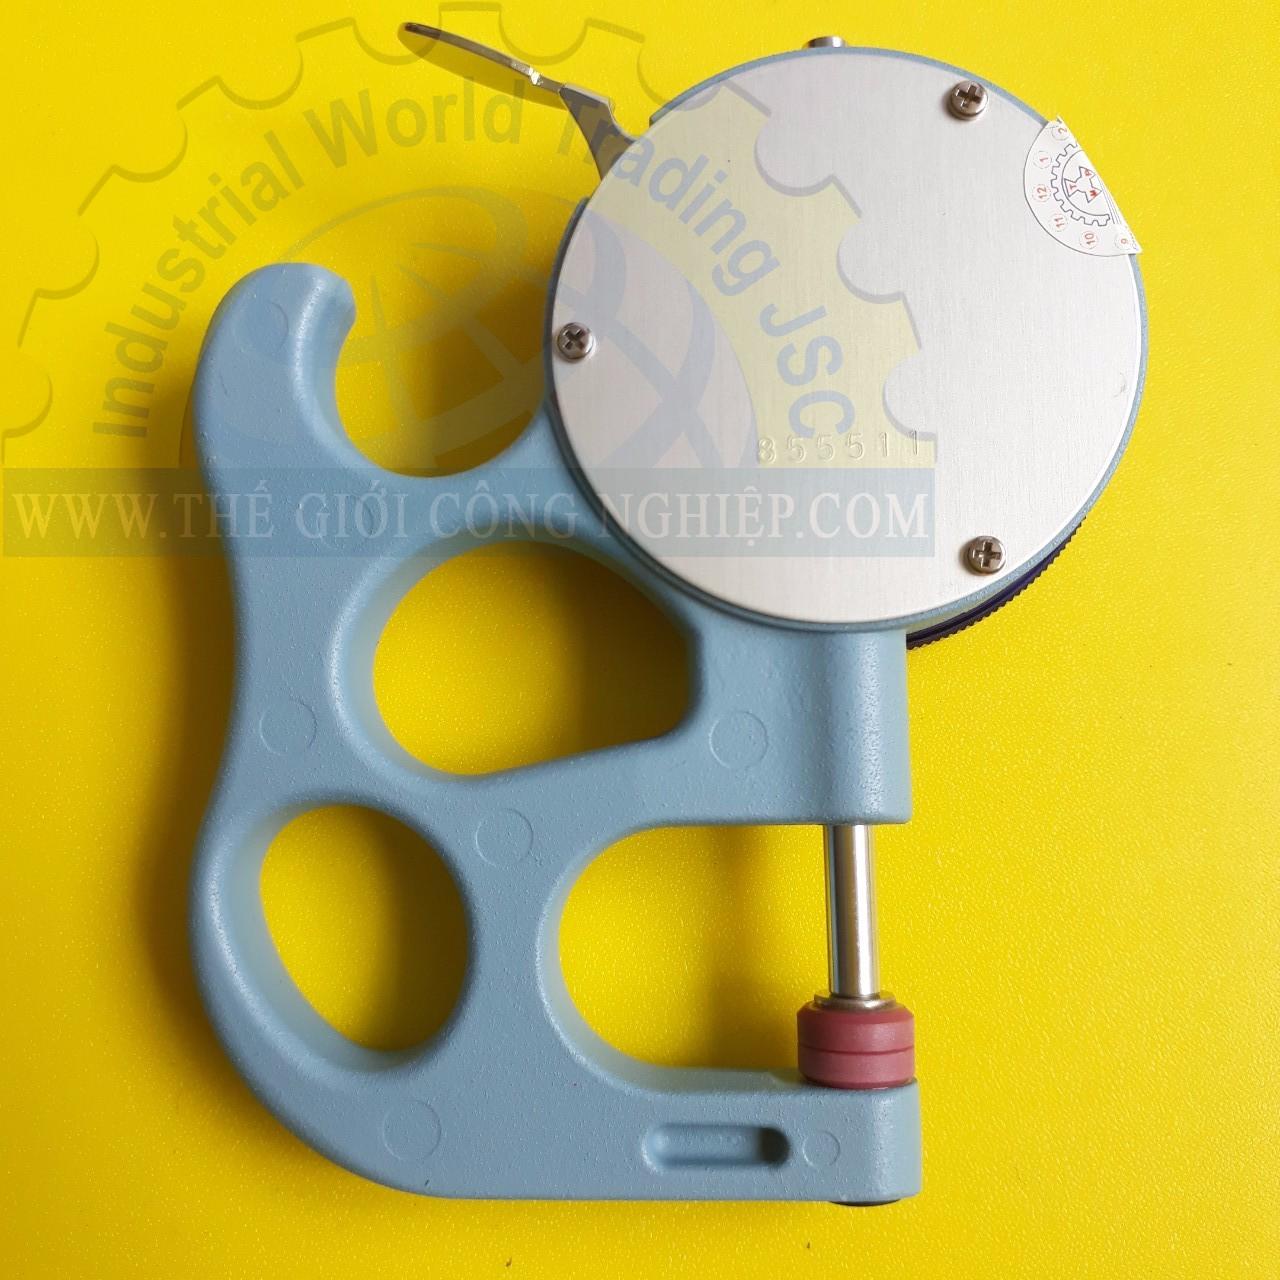 Dial Thickness Gauge SM-112 Teclock